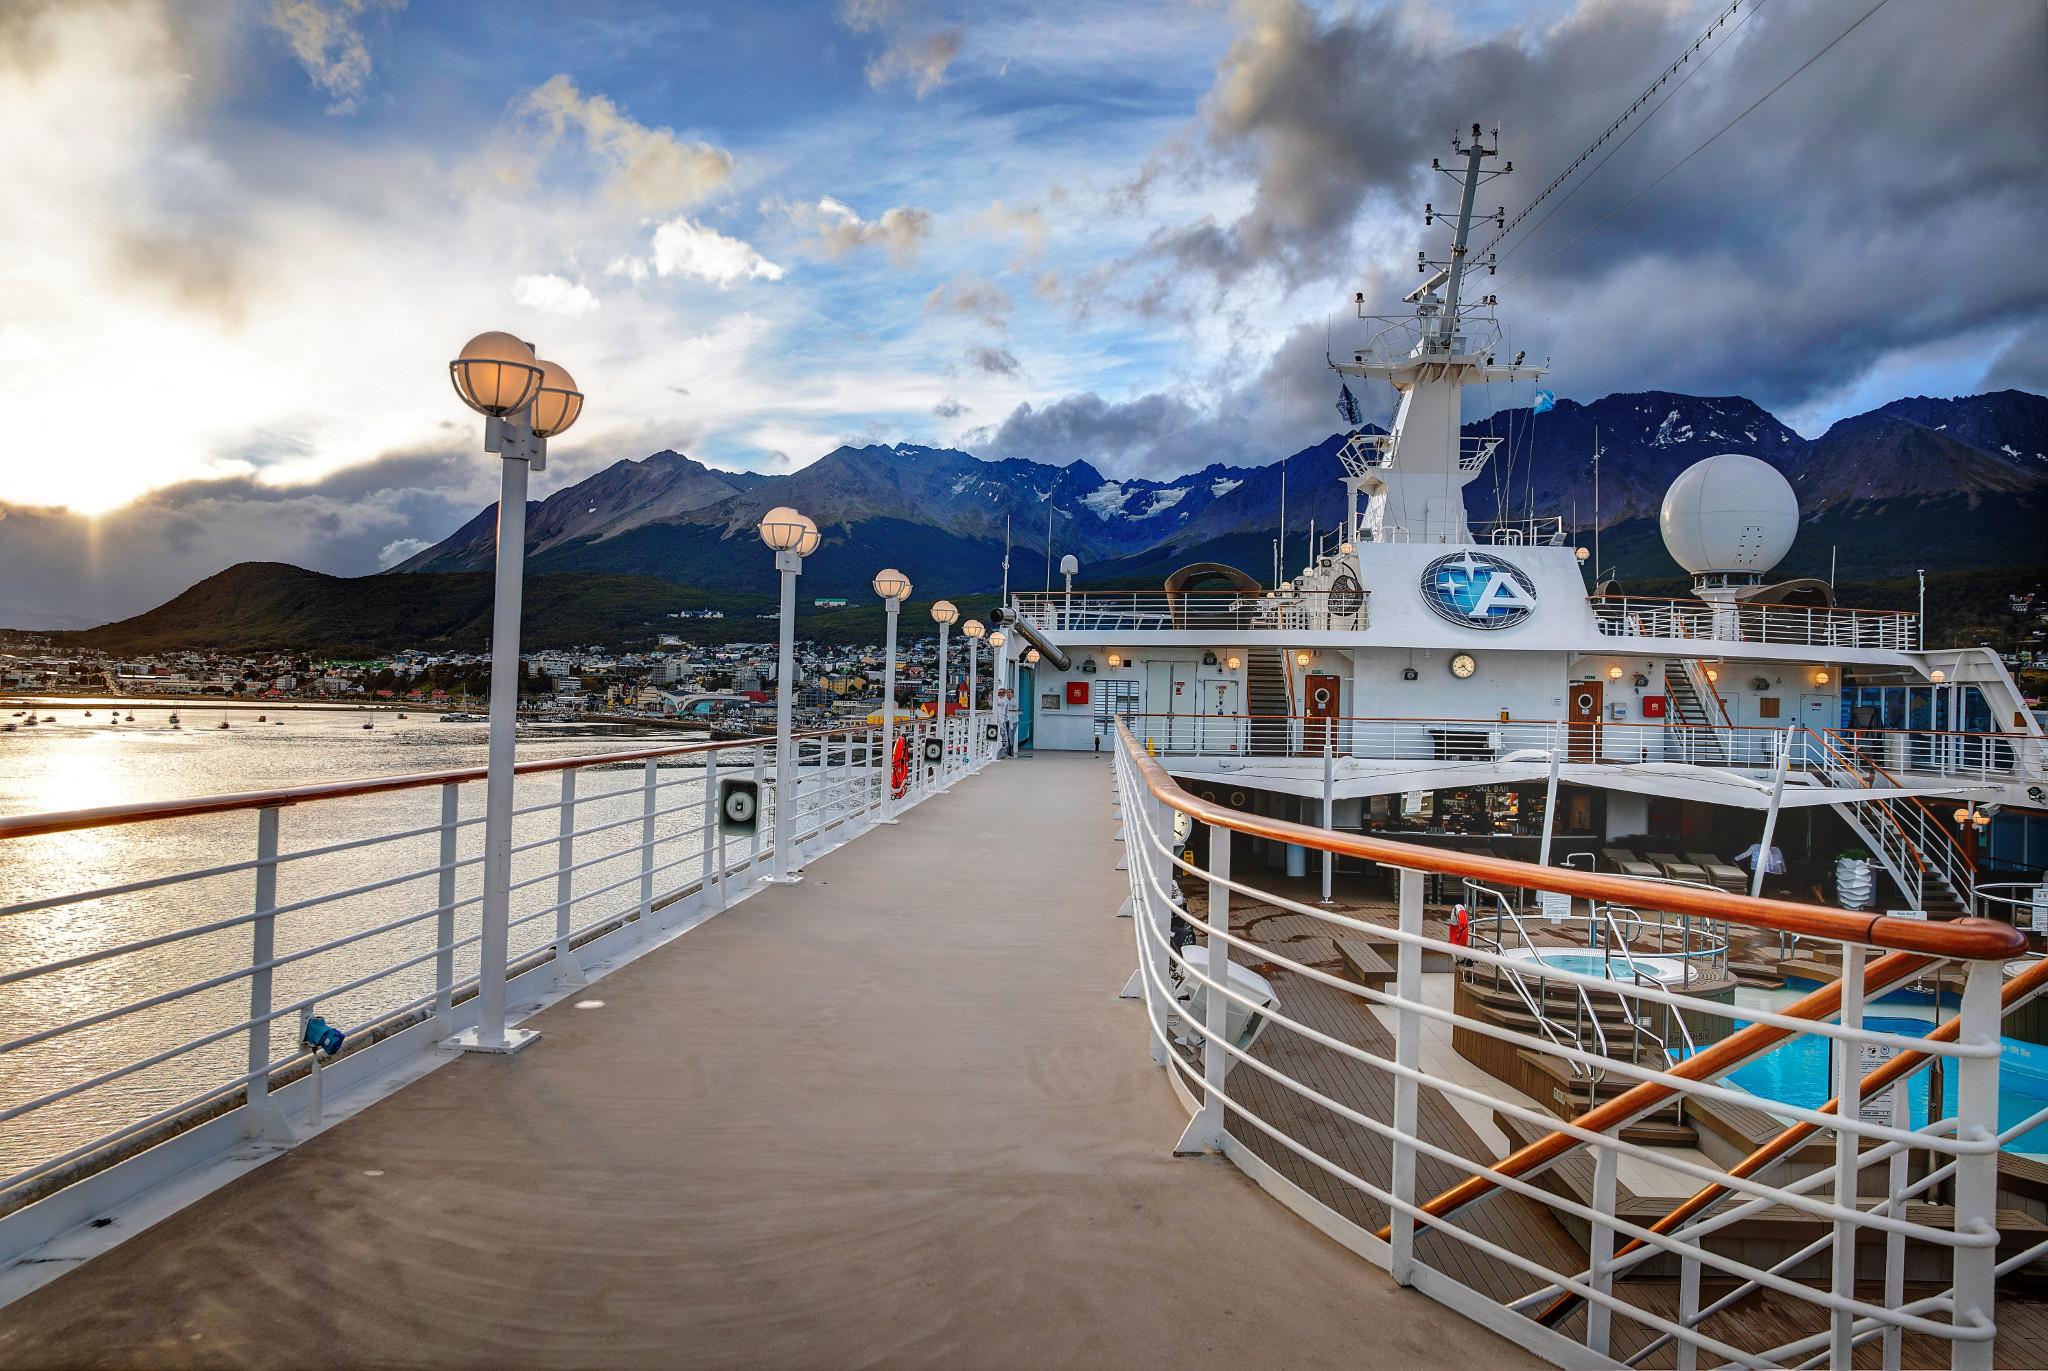 Azamara cruise ship docked in Argentina.